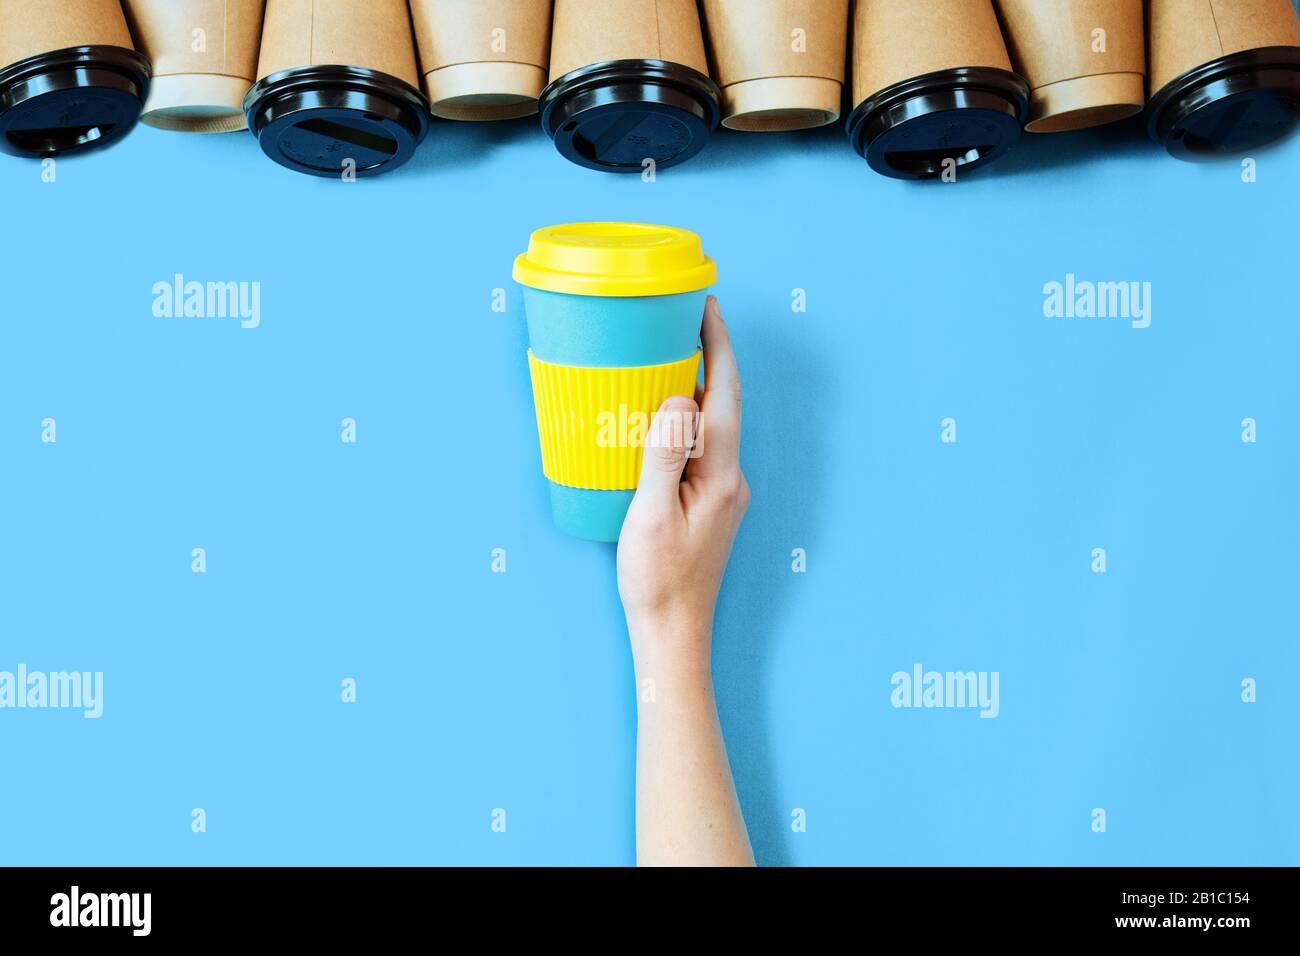 Tazas de café de bambú azul background.One eco taza de café en la mano femenina. Foto de stock